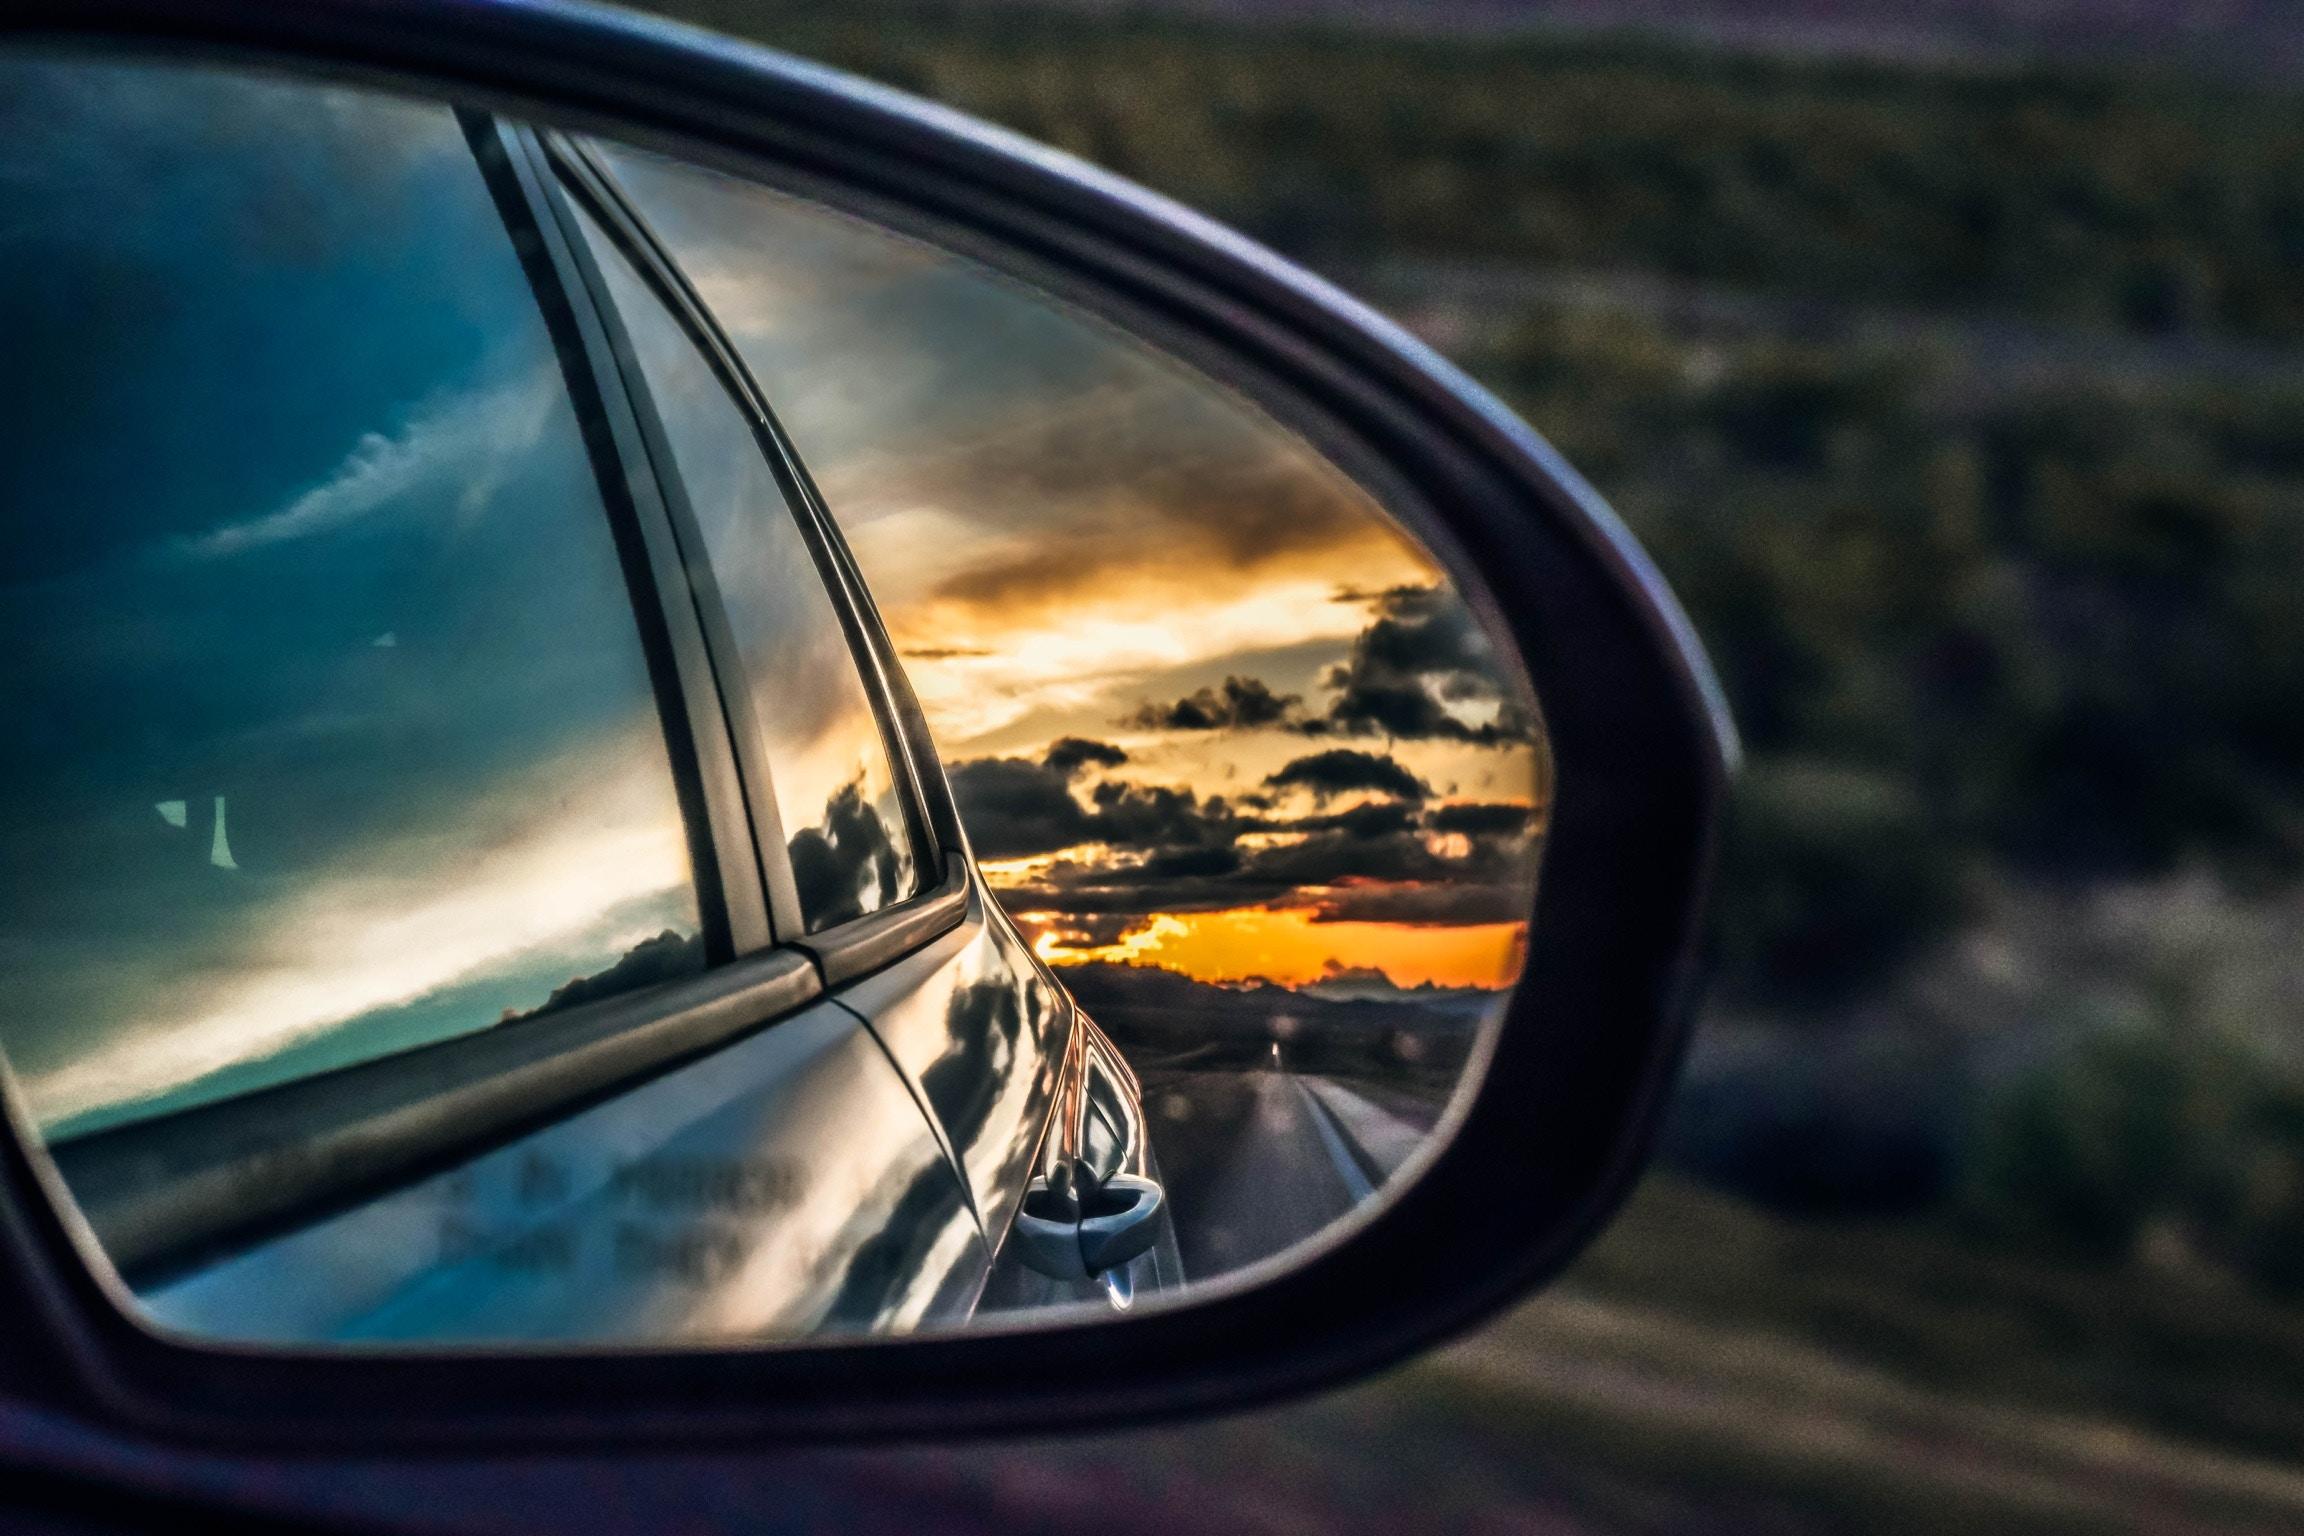 Der Blick in den Rückspiegel